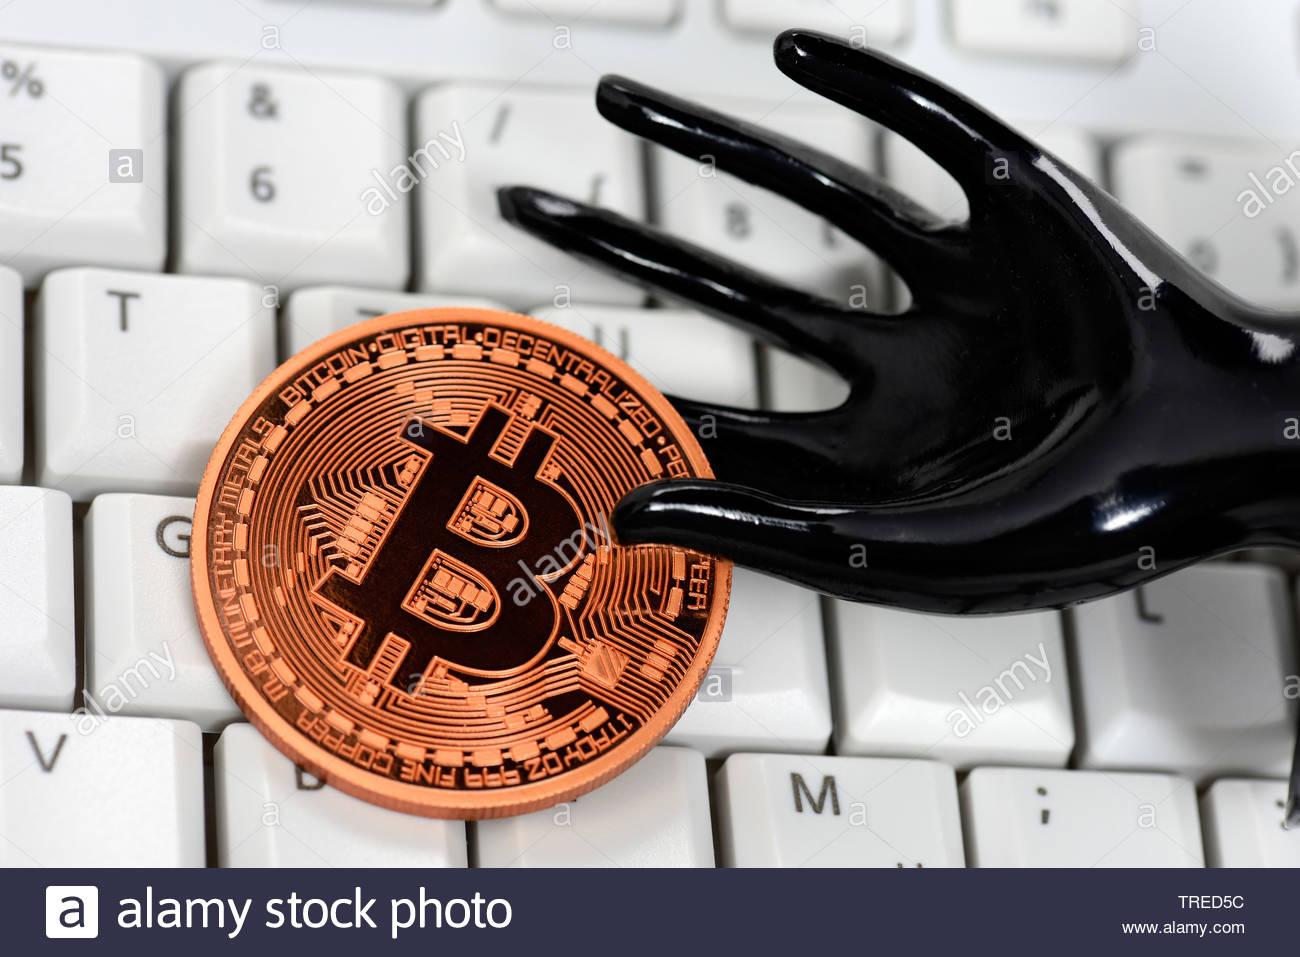 Bitcoin-Muenze auf einer Tastatur | Bitcoin on a keyboard | BLWS523400.jpg [ (c) blickwinkel/McPHOTO/C. Ohde Tel. +49 (0)2302-2793220, E-mail: info@bl - Stock Image